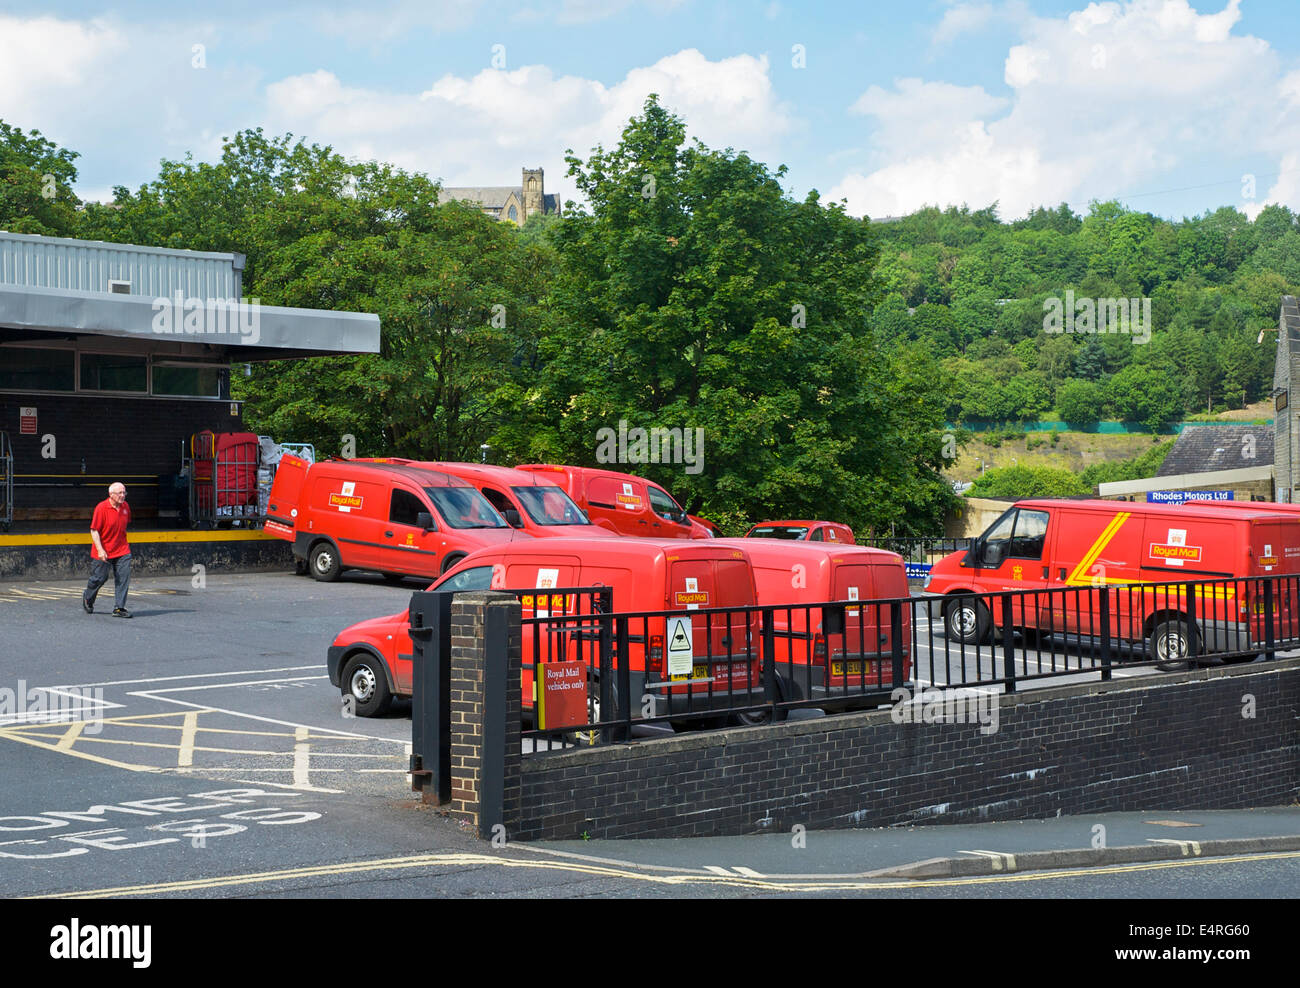 Royal mail vans in Halifax, West Yorkshire, England UK - Stock Image